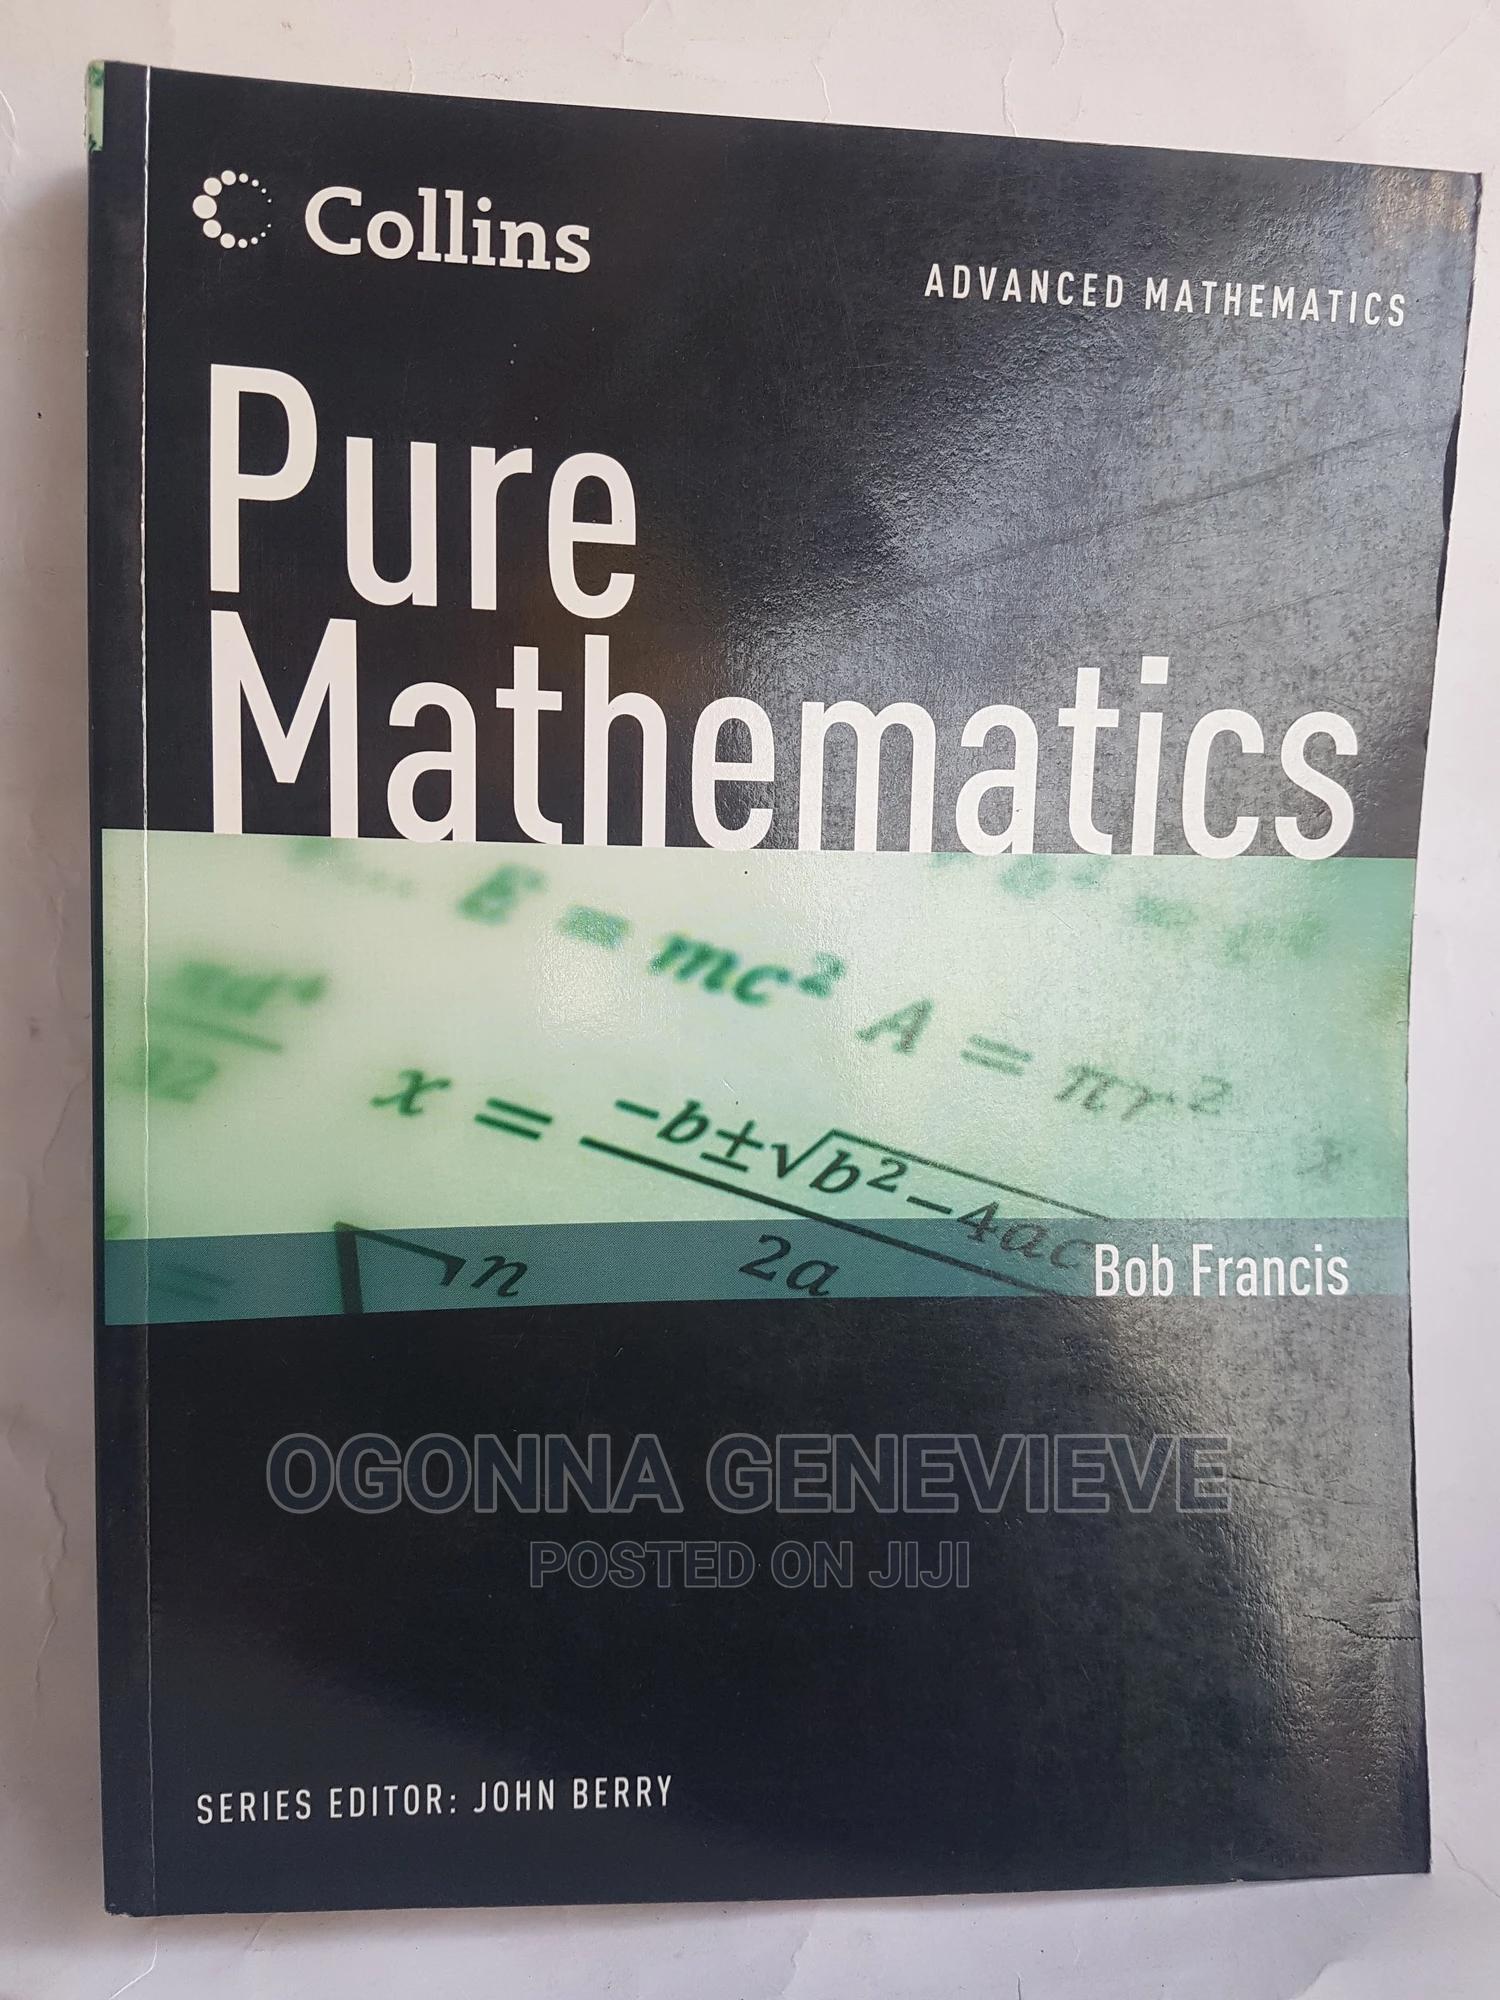 Collins Pure Mathemtics